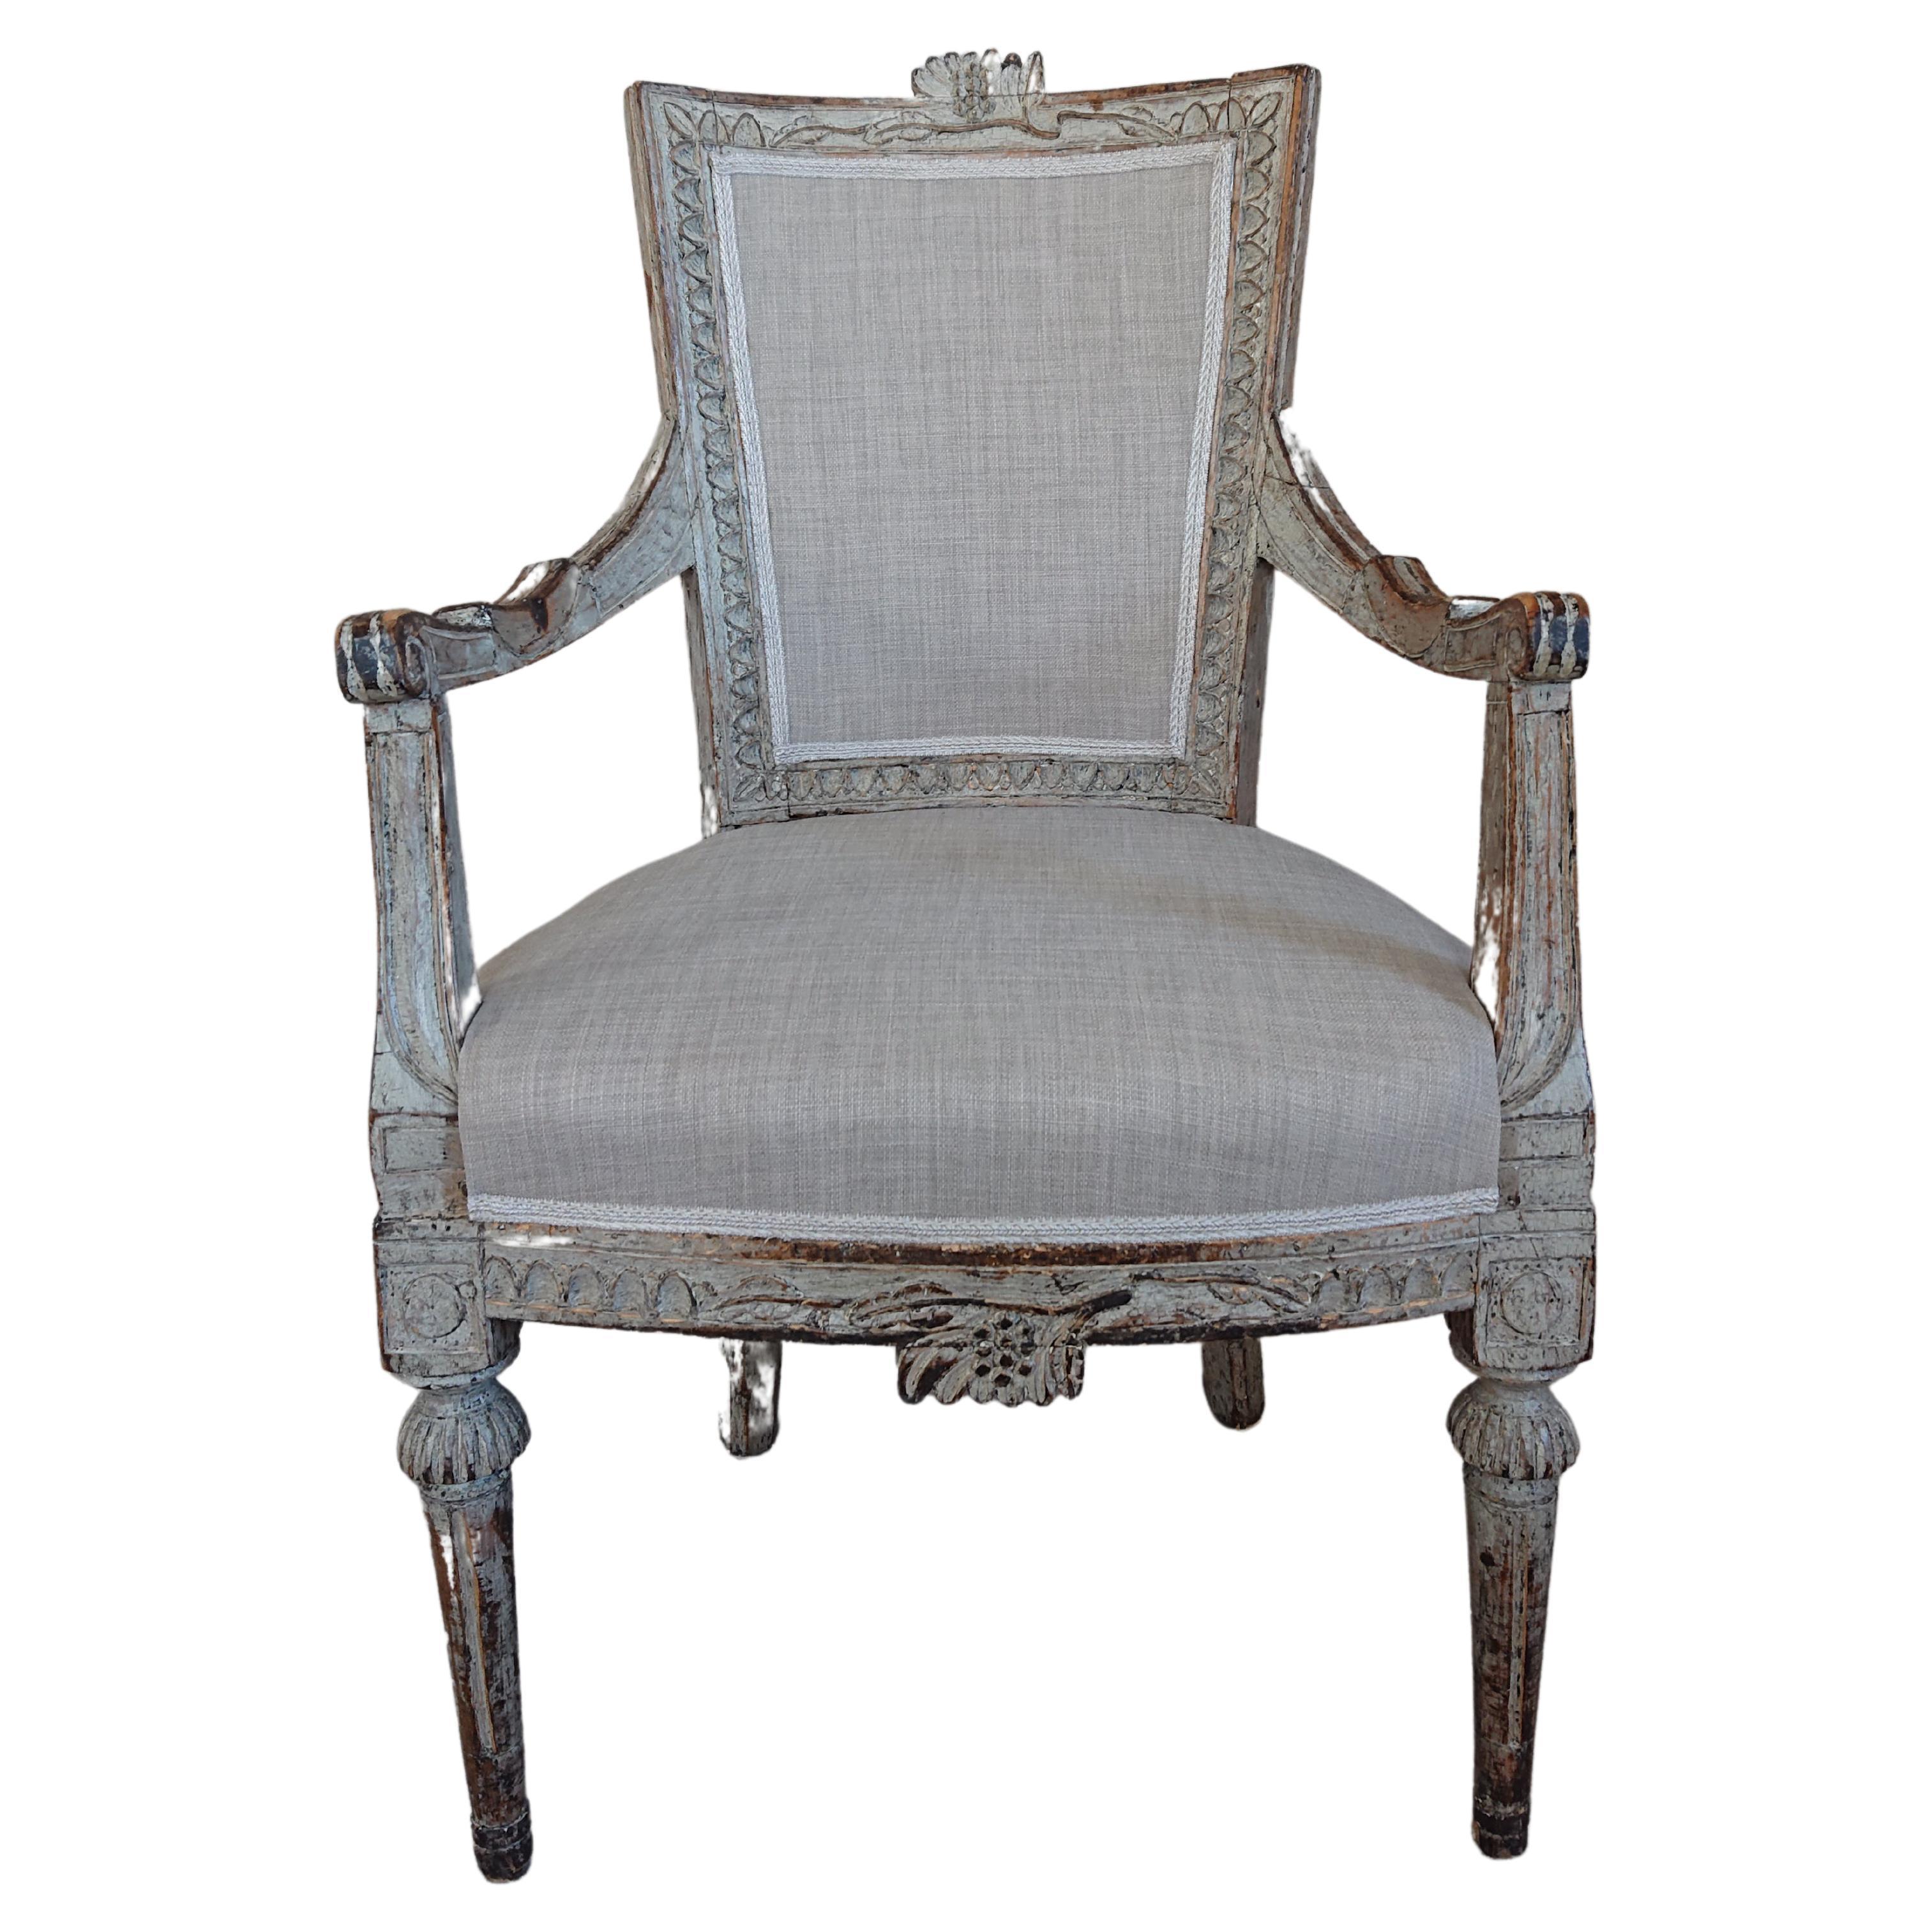 18th Century Swedish Gustavian Armchair with Originalpaint